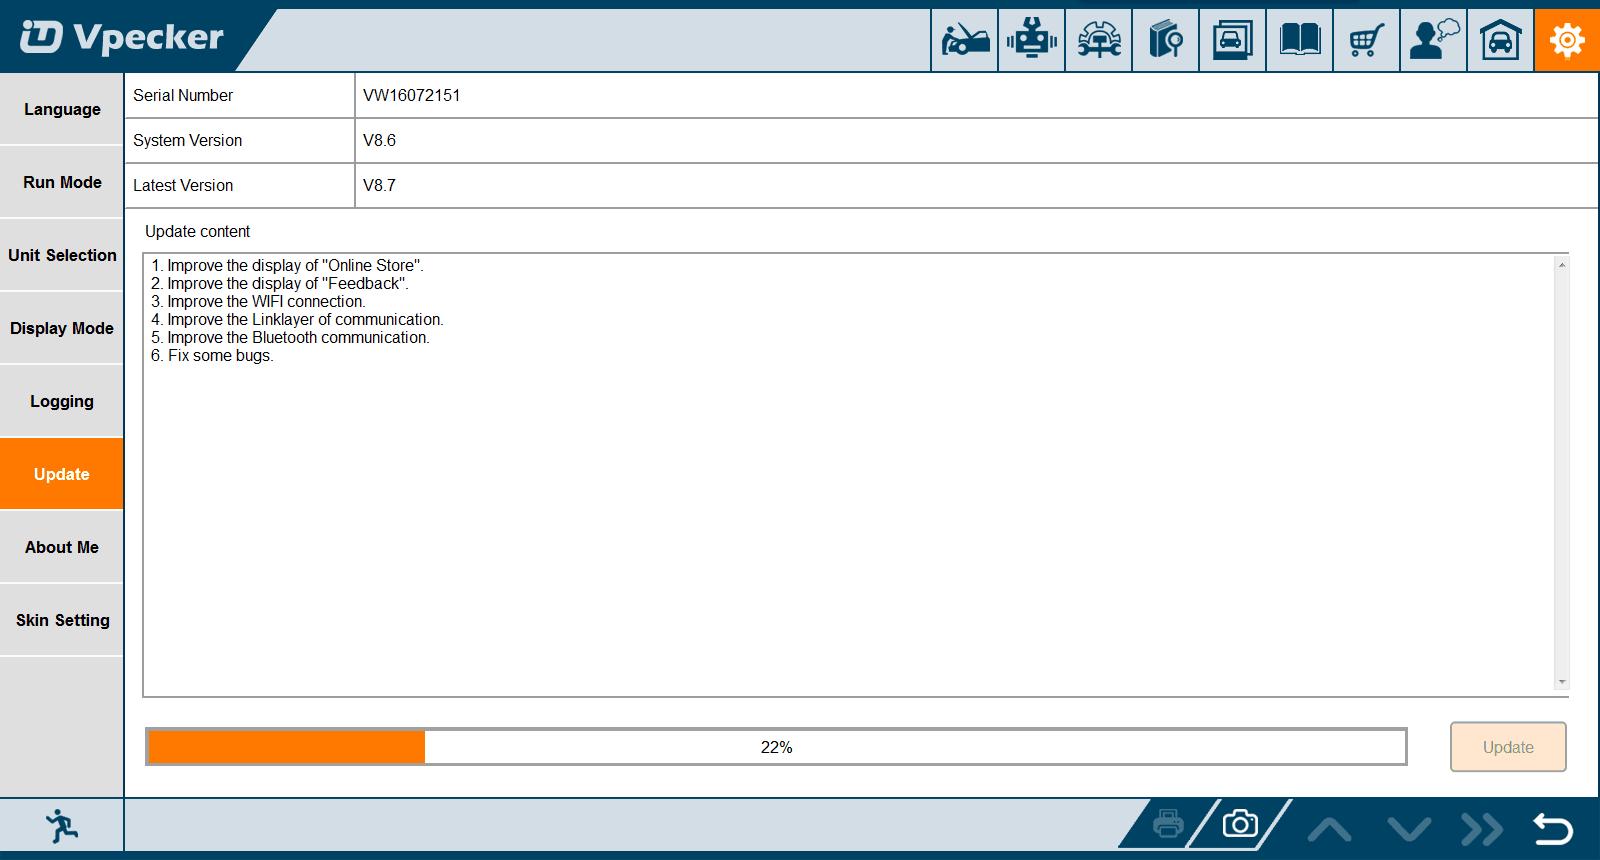 vpecker-update